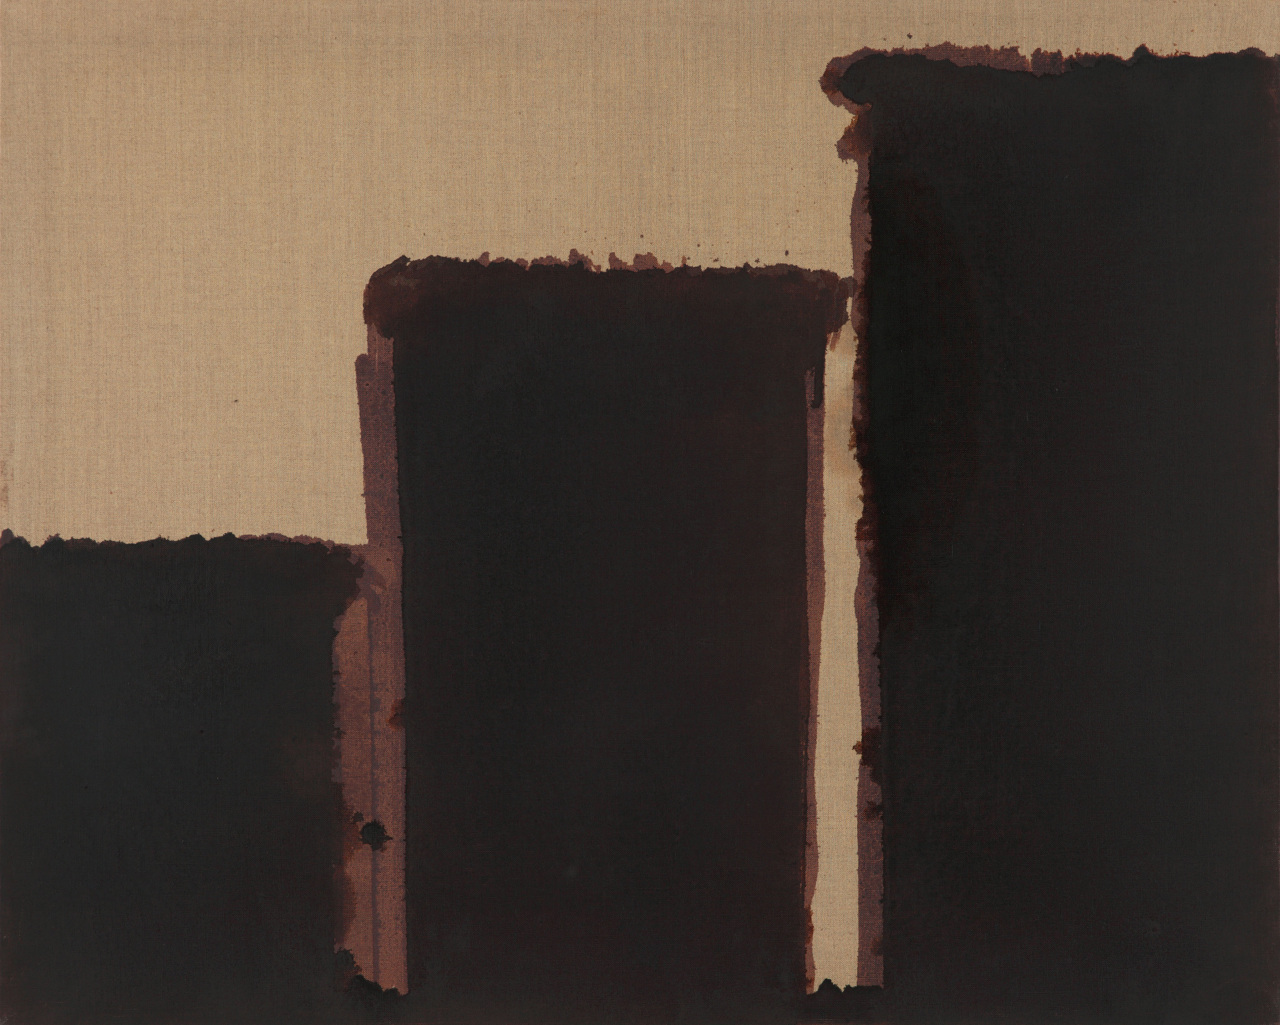 """Burnt Umber & Ultramarine"" by Yun Hyong-keun (PKM Gallery)"